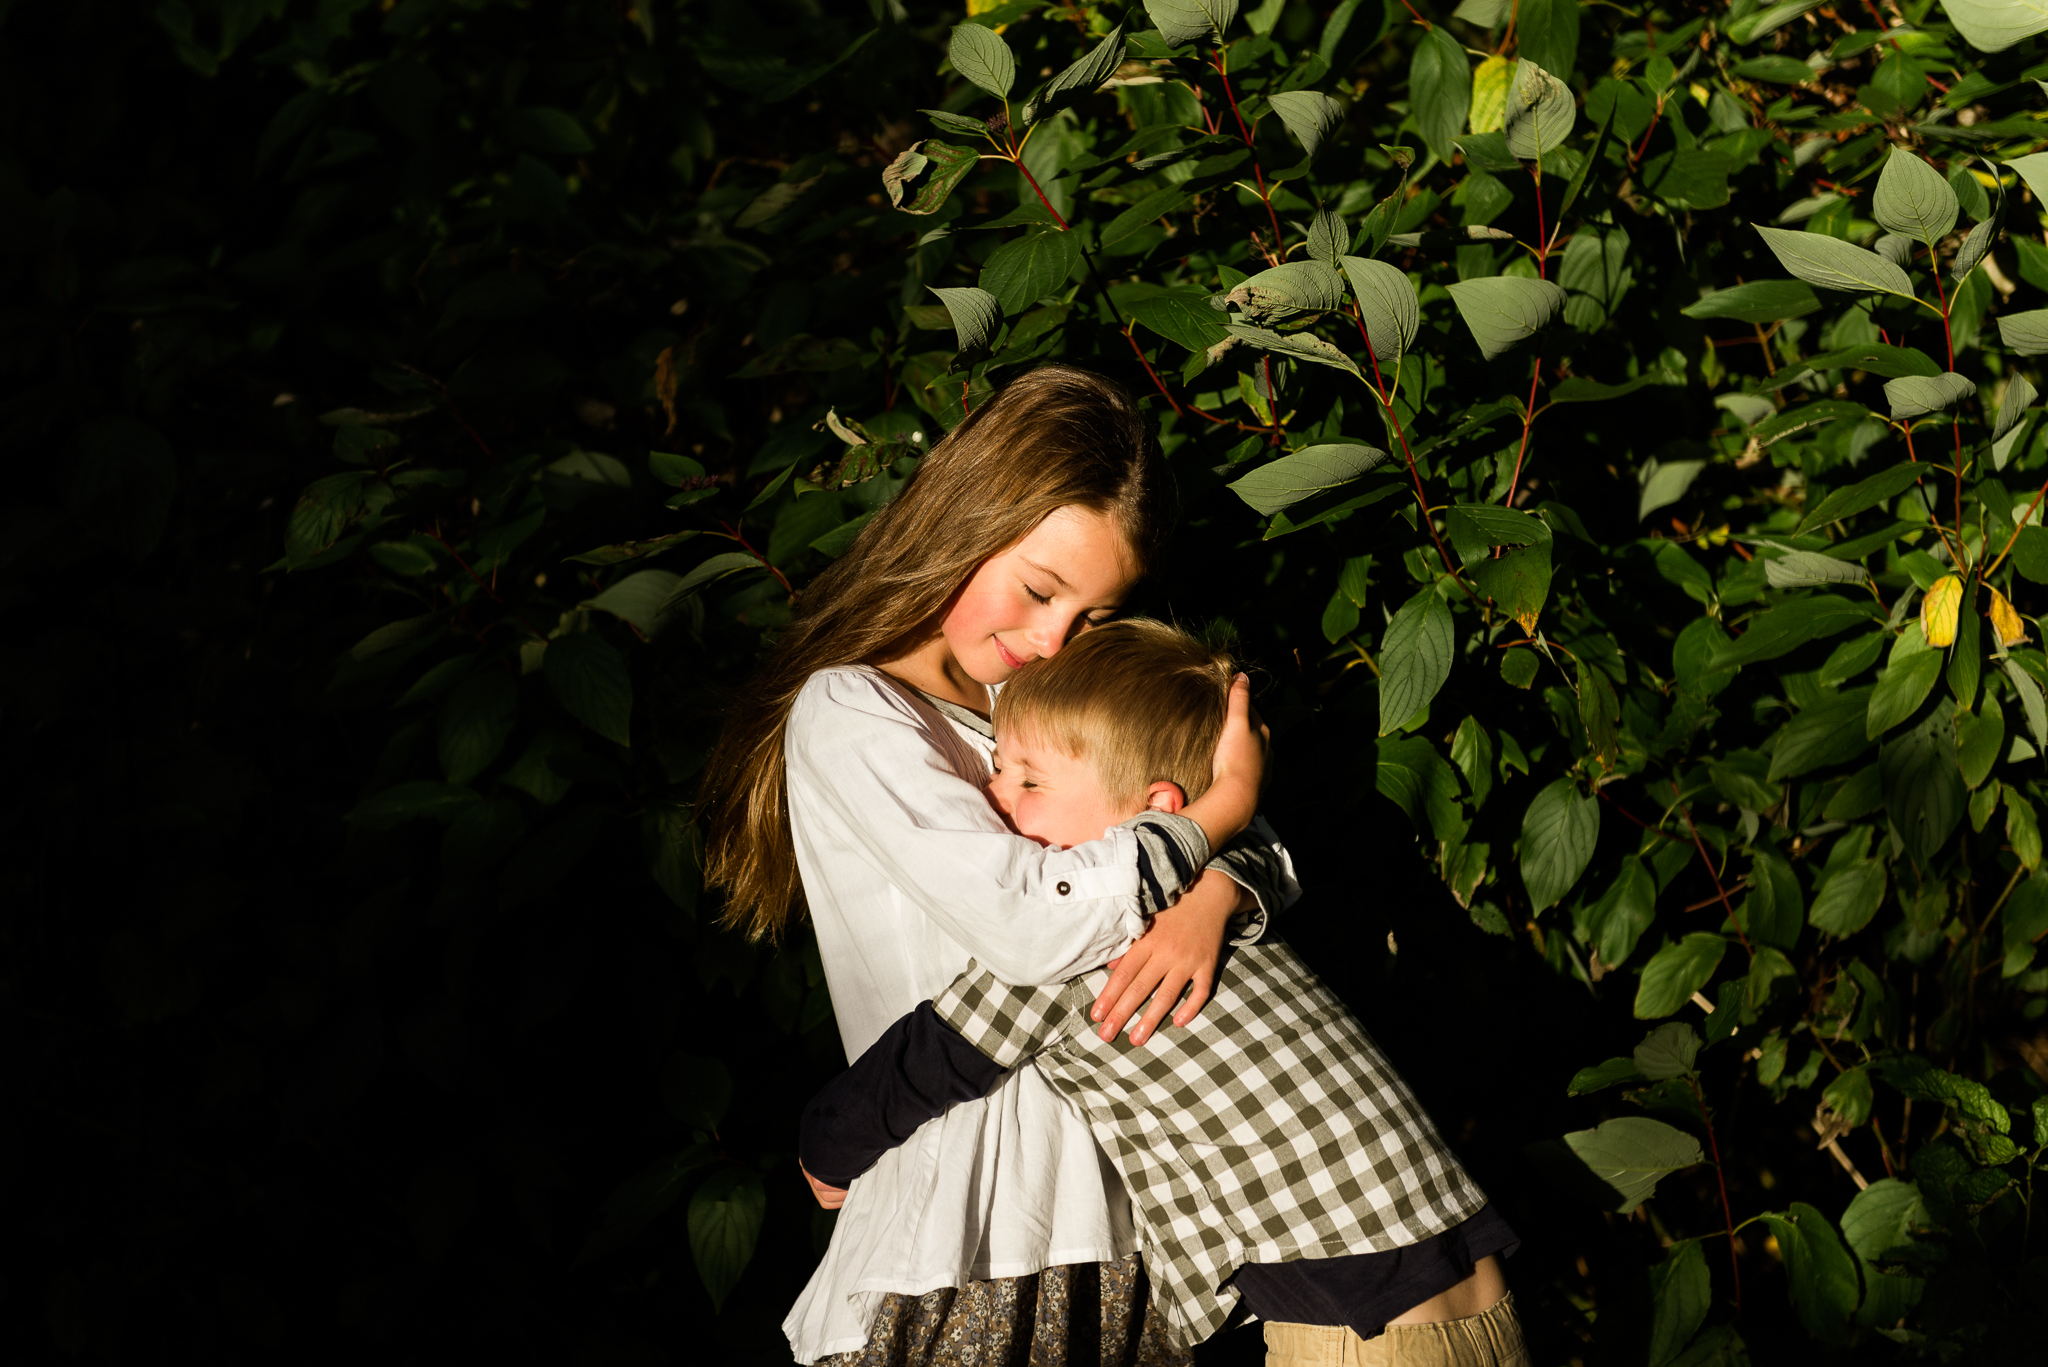 Childhood Photography Lifestyle Child Portraits Kids Children Autumn Outoors - Jenny Harper-3.jpg